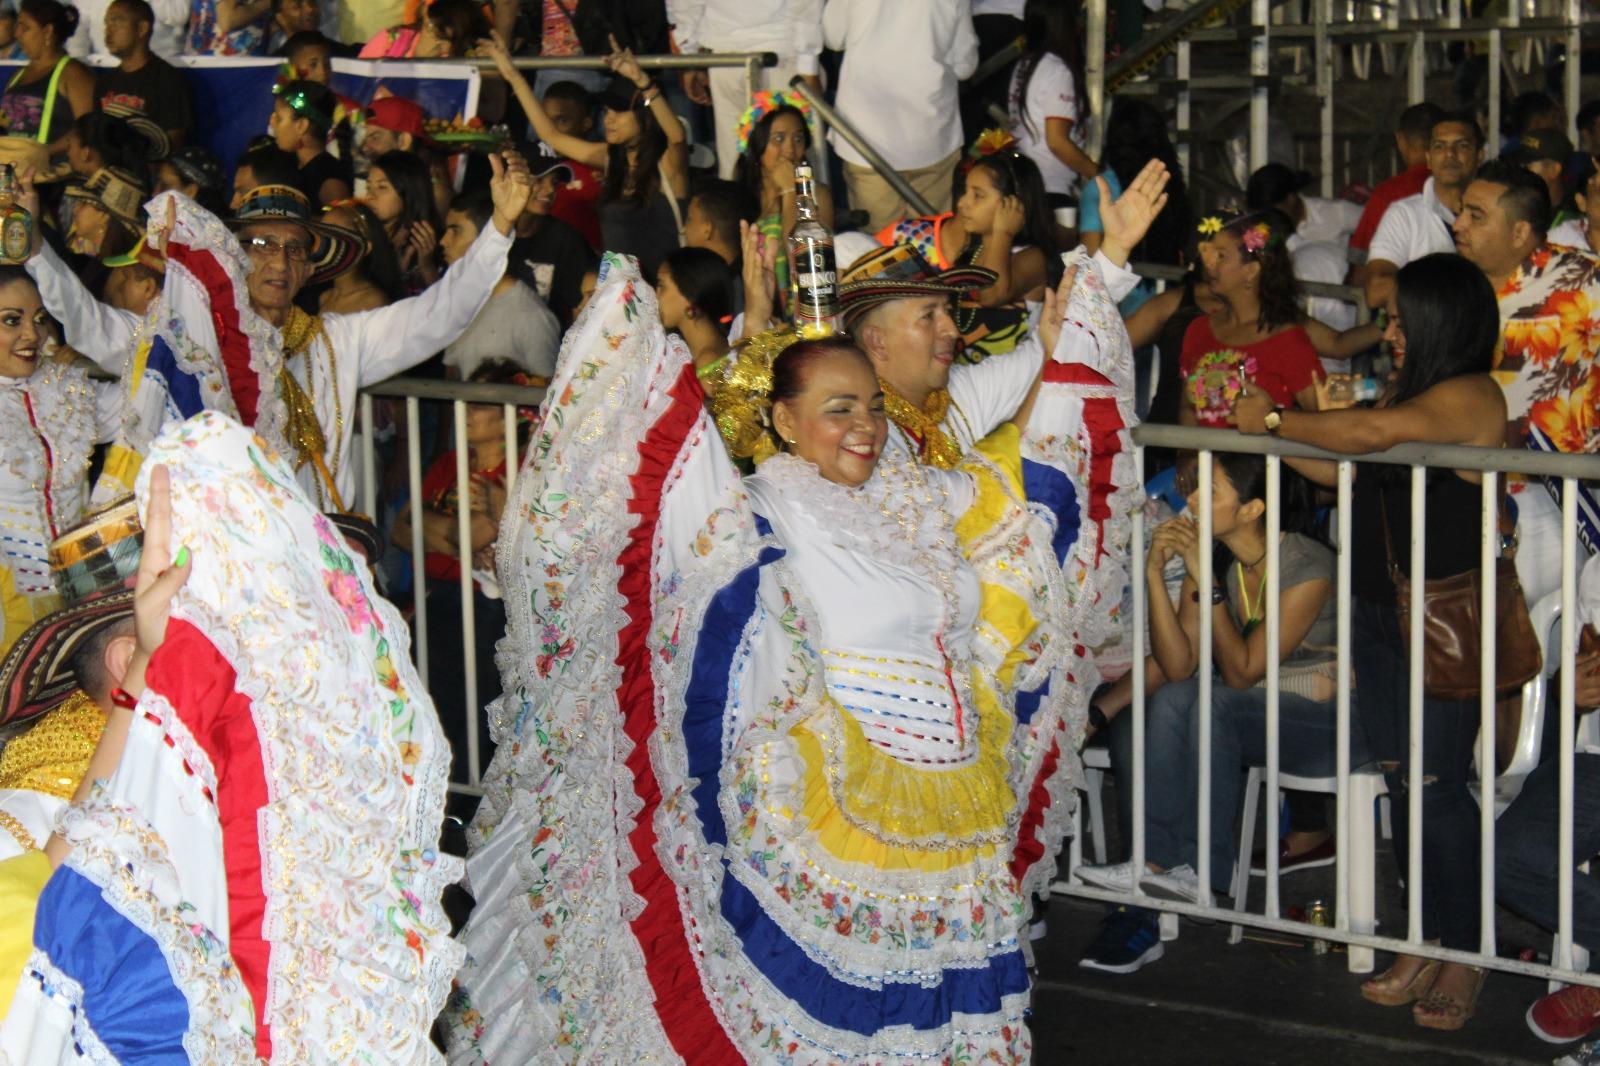 La Cumbia, baile tradicional /Foto FarfreyFashion